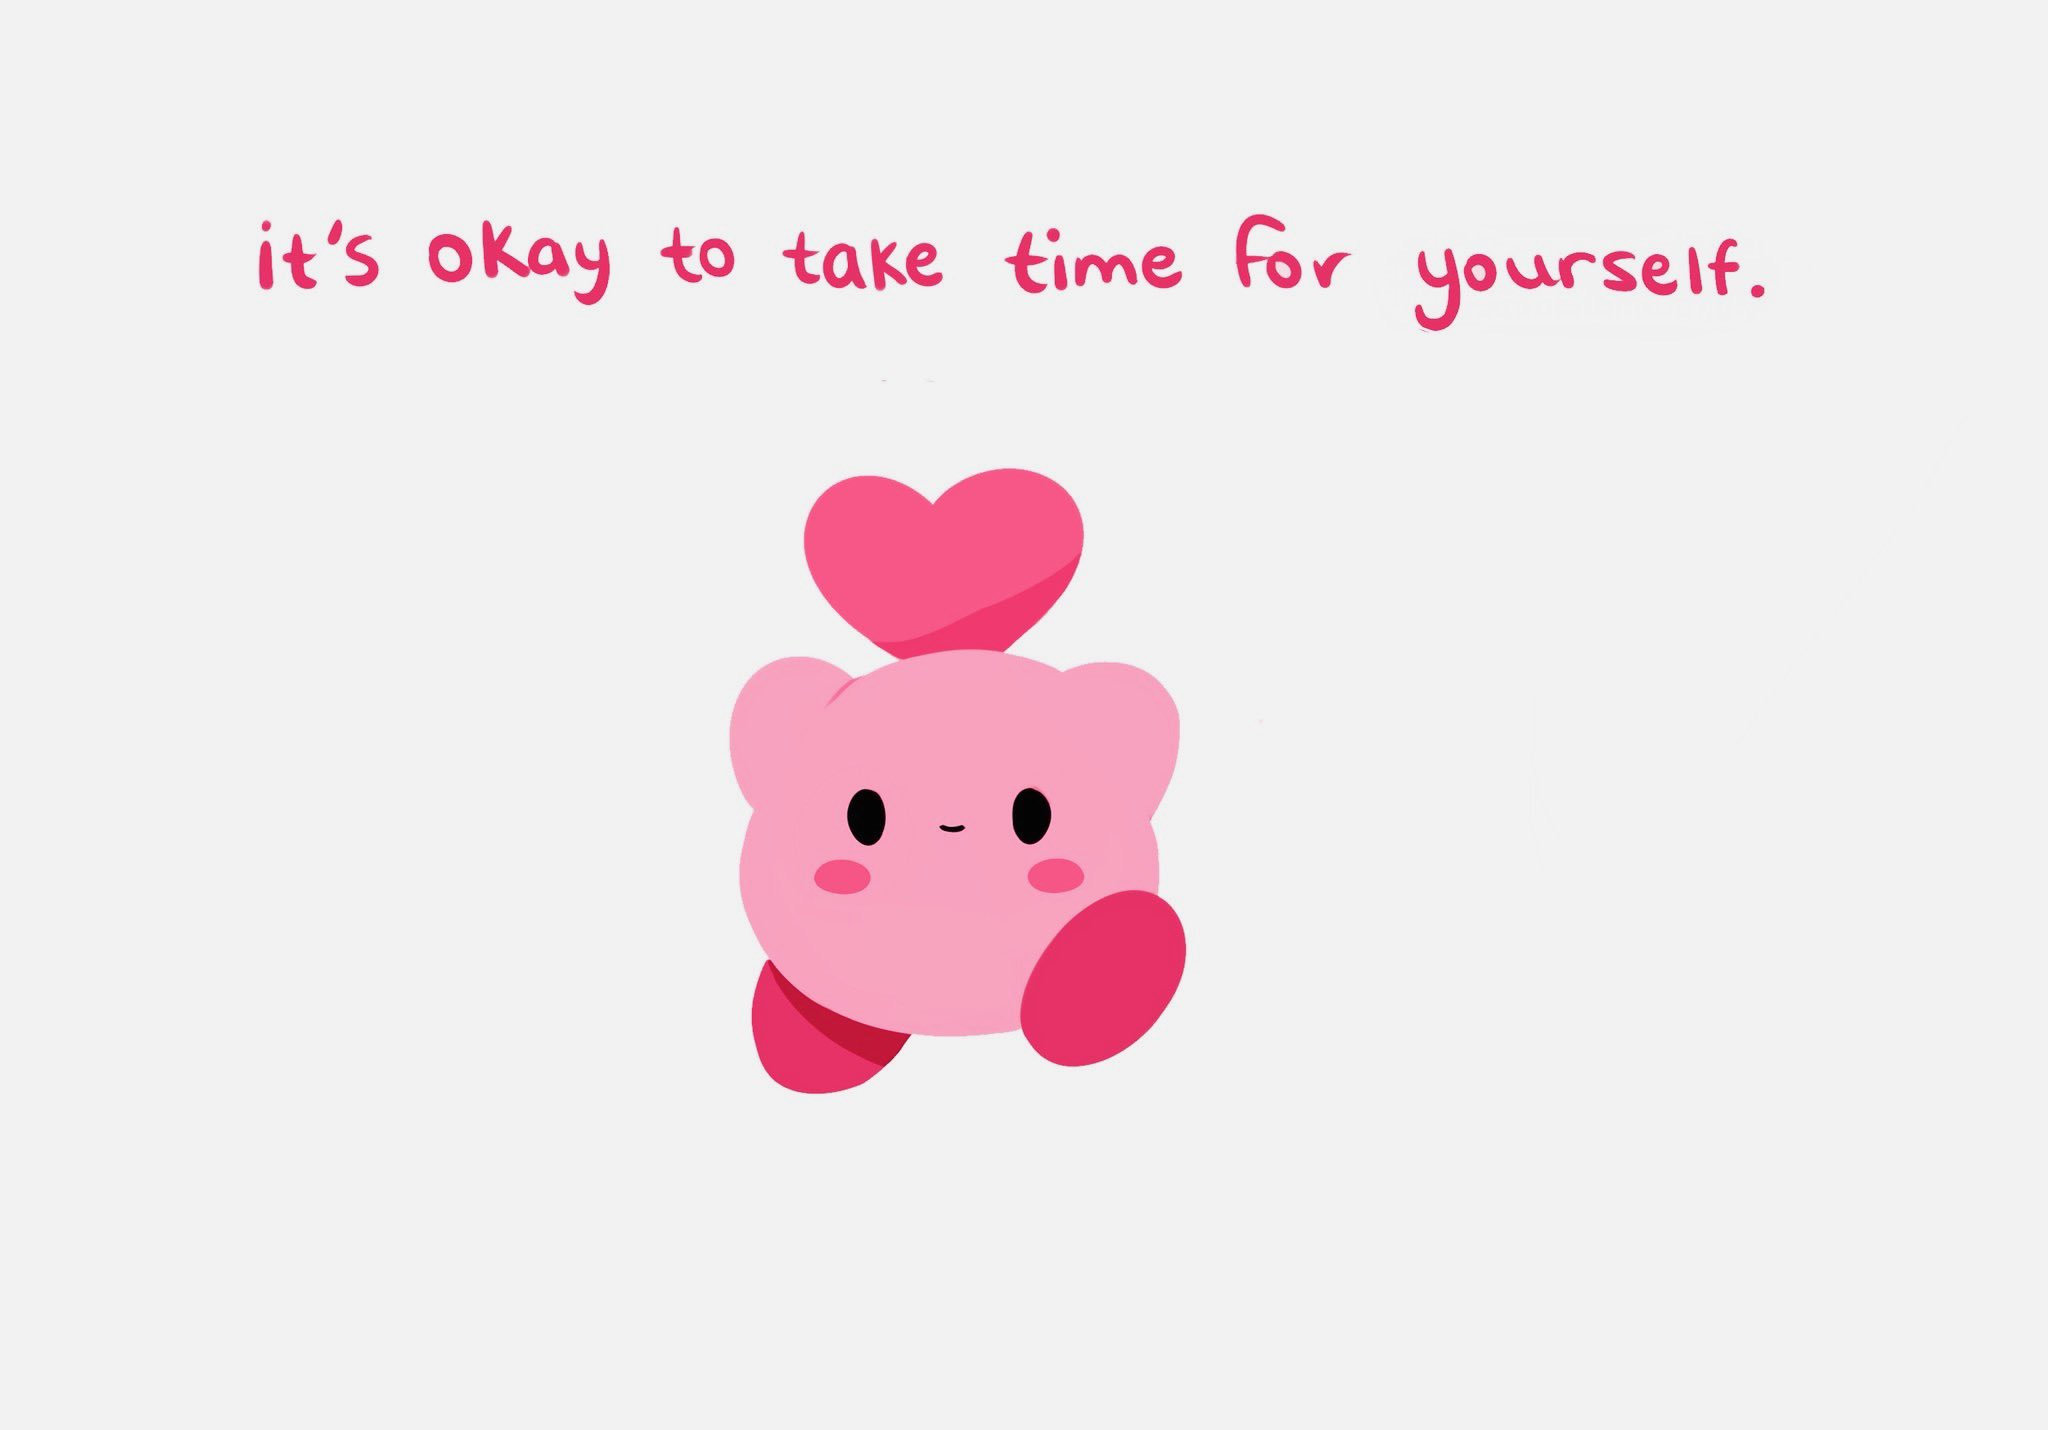 Memes Positivity meme Kirby from Nintendo